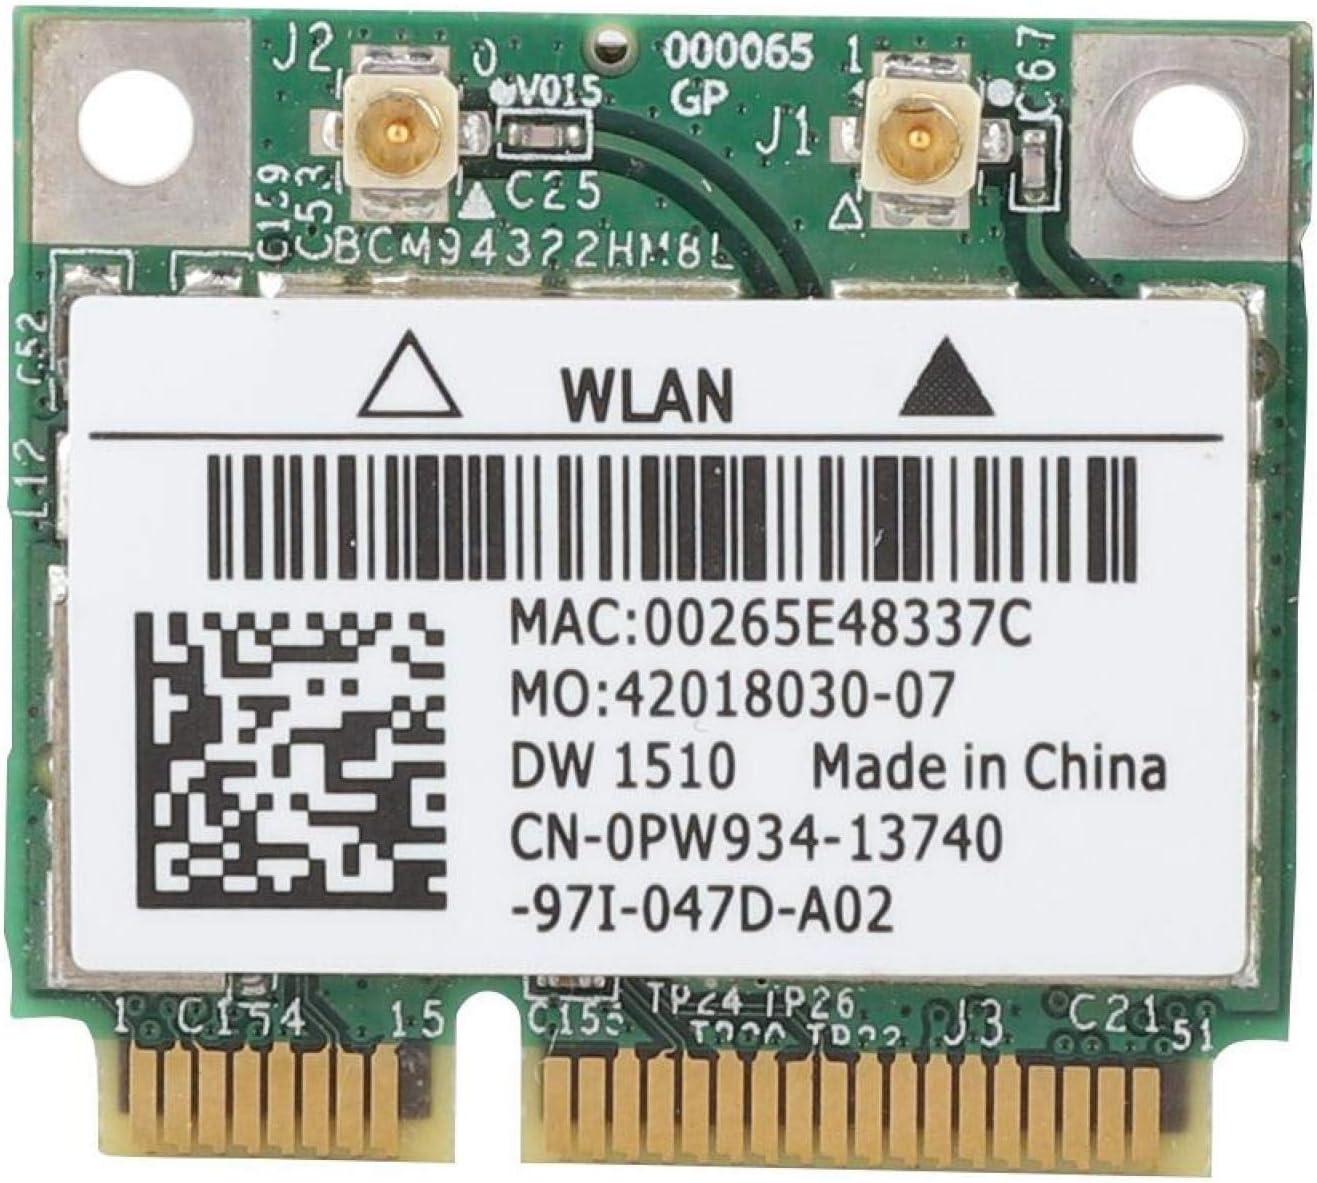 Sutinna Wireless Network Card, BCM94322HM8L DW1510 Dual Band PCI Express 5GHz/2.4GHz 300Mbps Mini PCI-E WiFi Wireless Network Card for DELL E4200 E5500